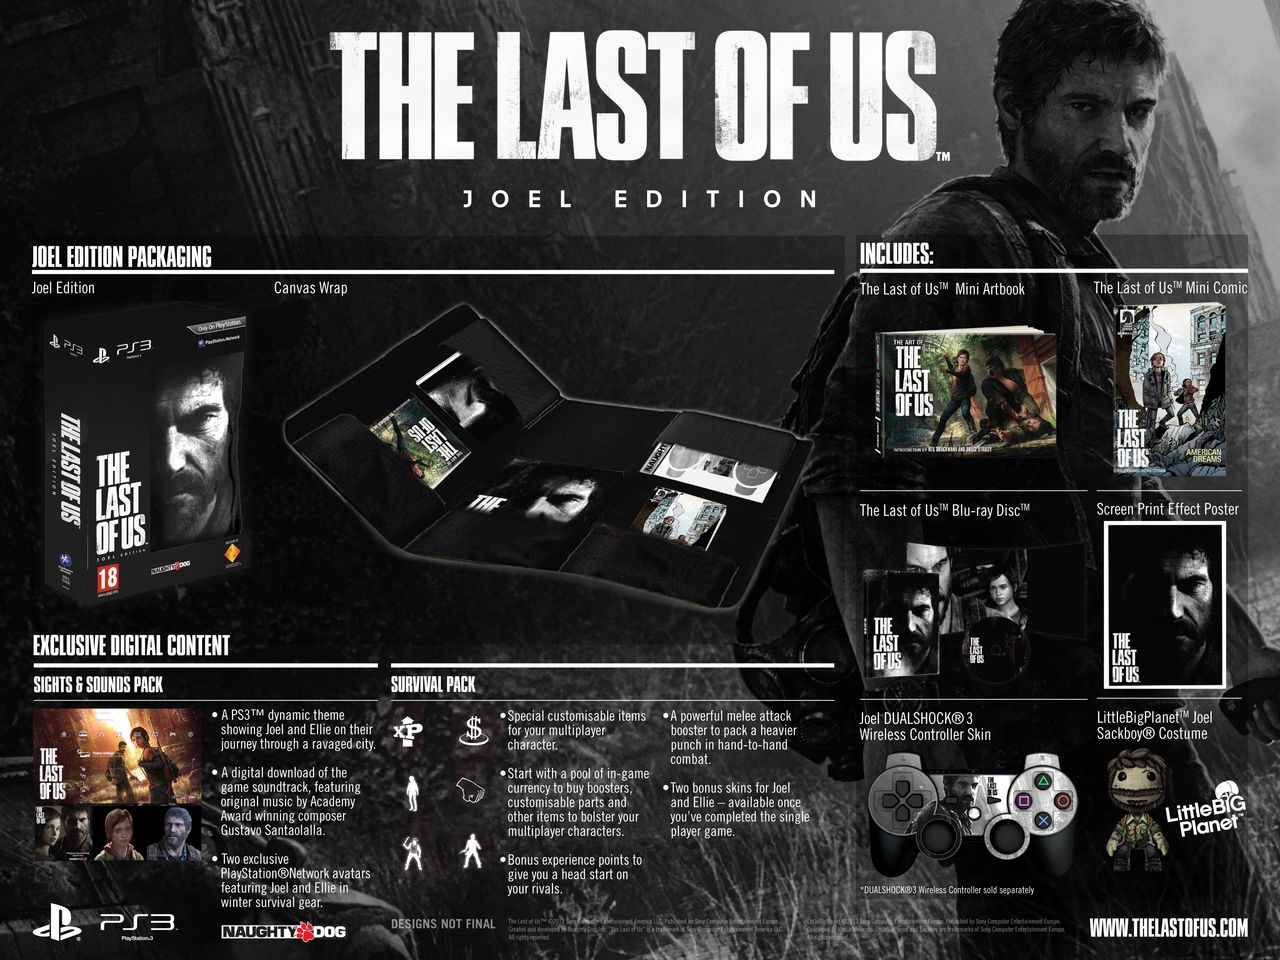 The Last of Us Joel Edition